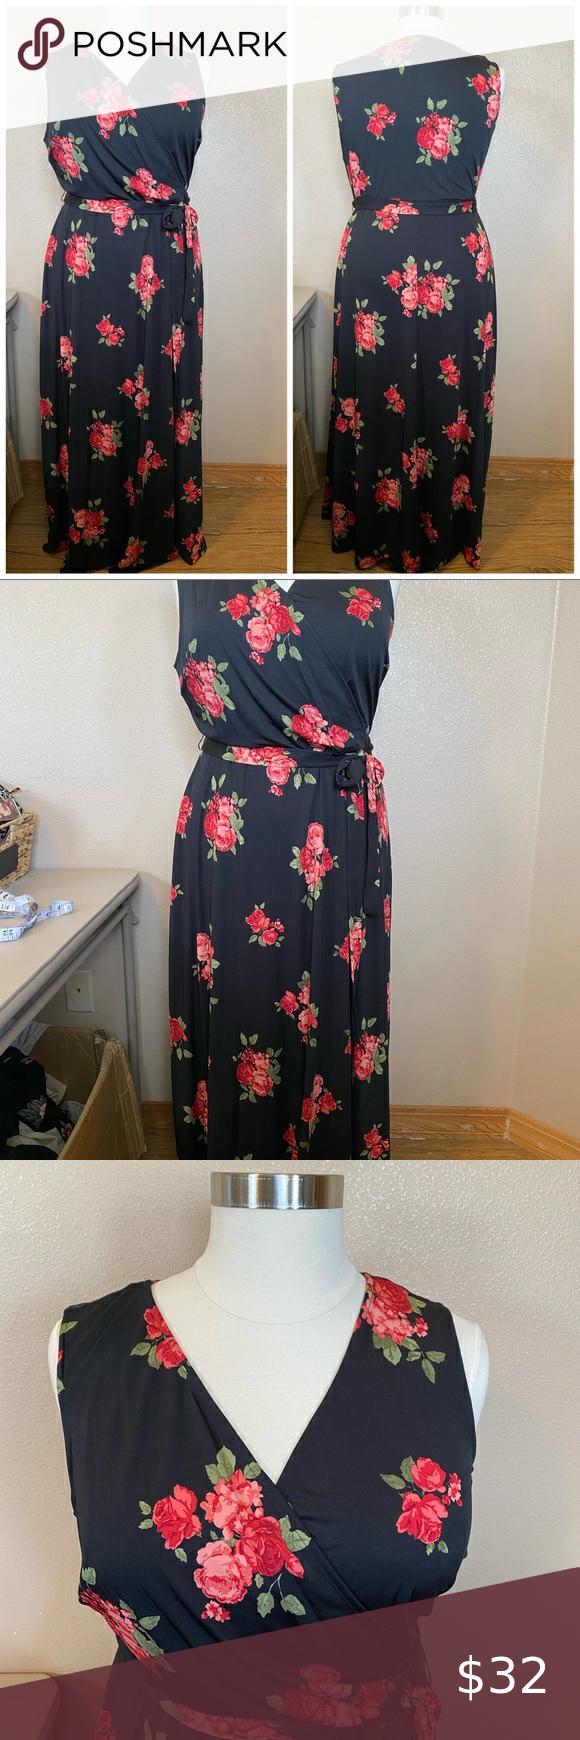 Love Squared Plus Size 3x Maxi Dress Nwt Maxi Dress Clothes Design Plus Size [ 1740 x 580 Pixel ]